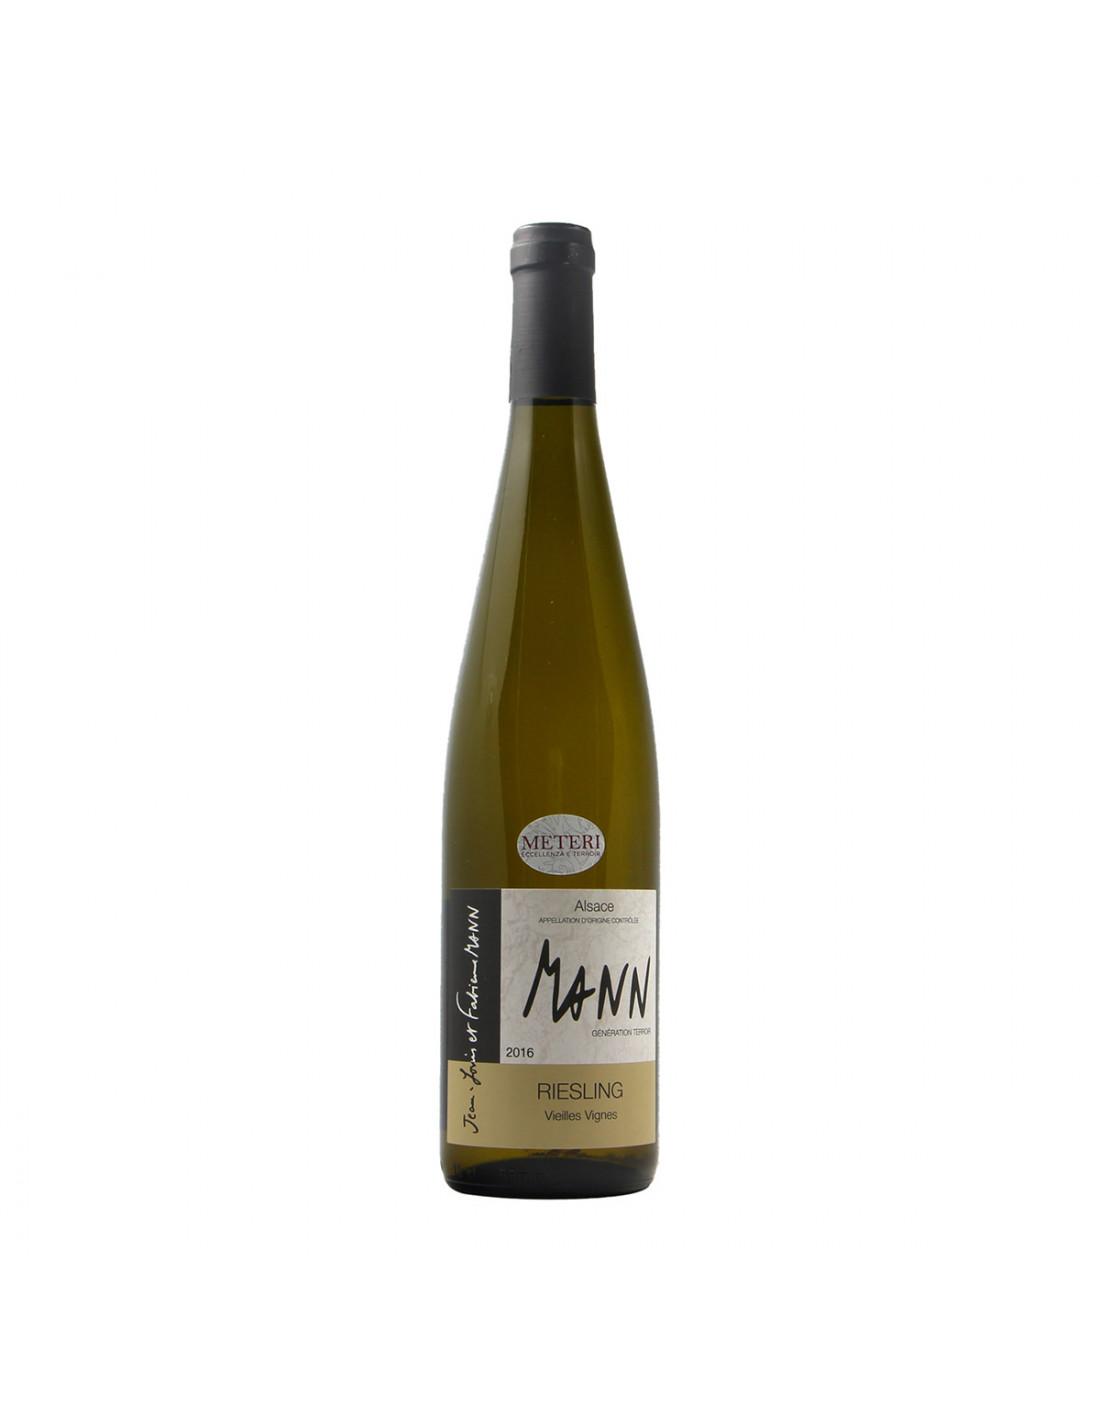 Mann Riesling Vieille Vignes 2016 Grandi Bottiglie